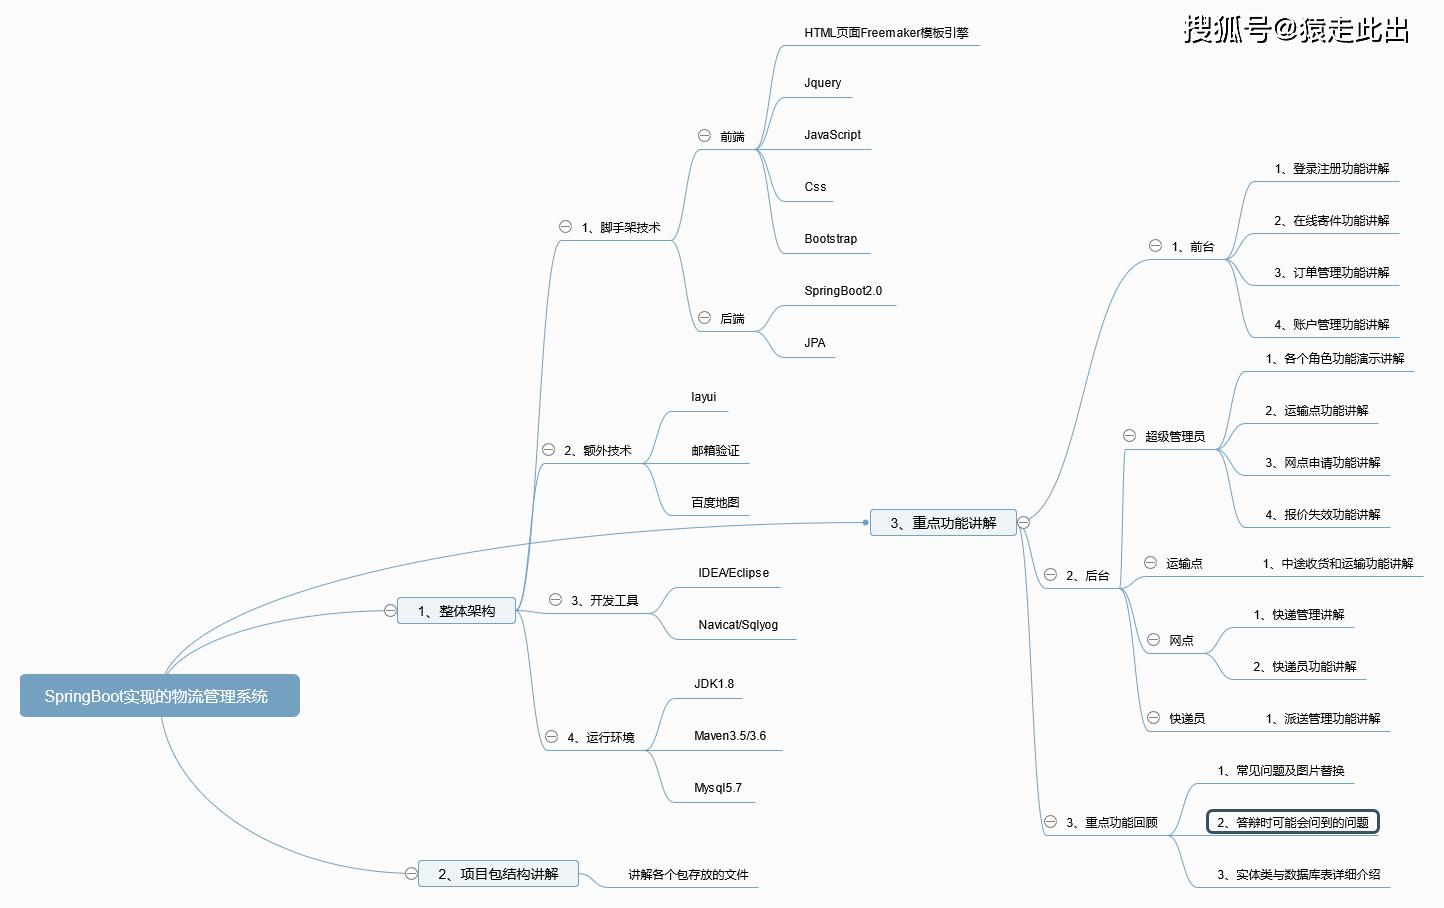 SpringBoot物流快递在线寄查快递系统+讲解教程+开发文档